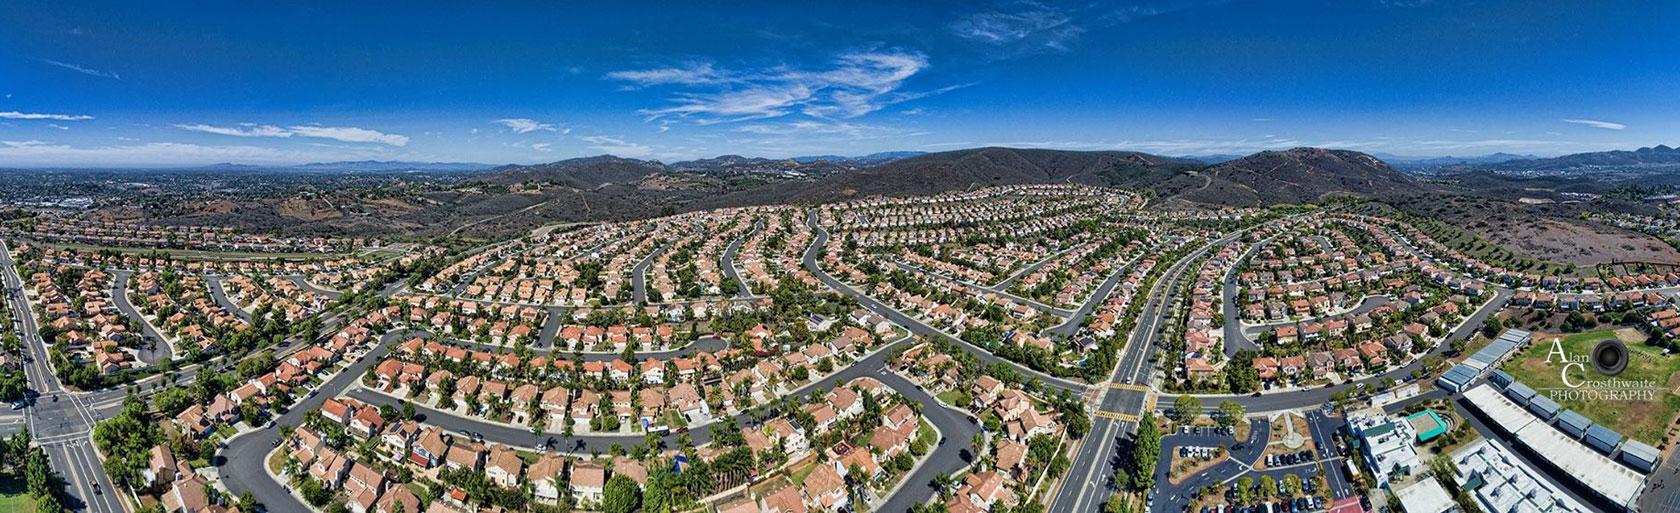 aerial-santa-fe-hills